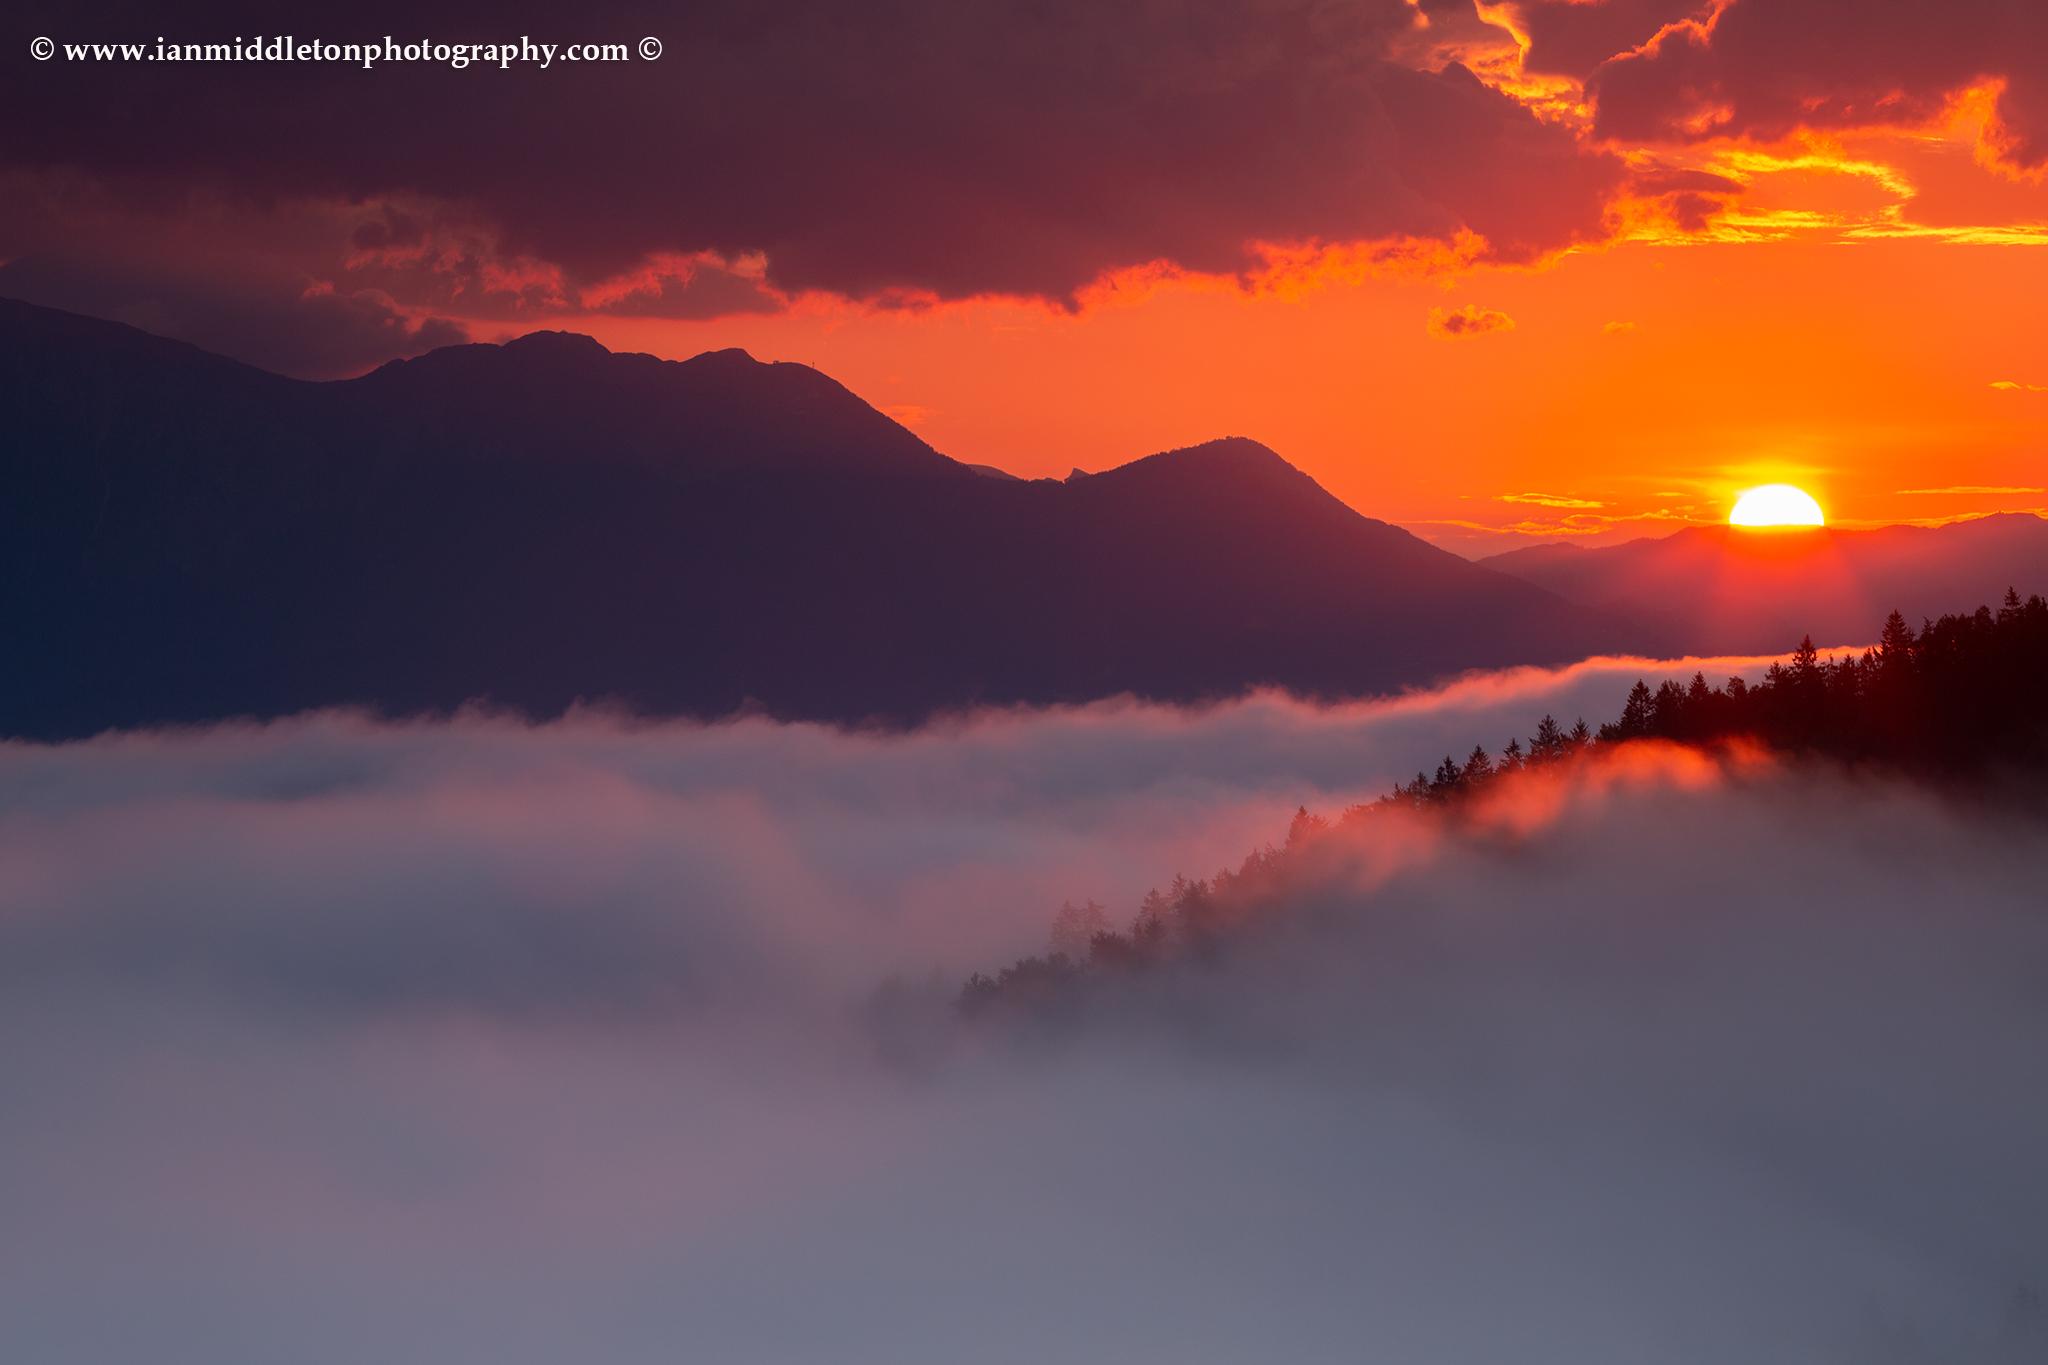 Sunrise over the Kamnik Alps, seen from Rantovše hill near Skofja Loka, Slovenia.